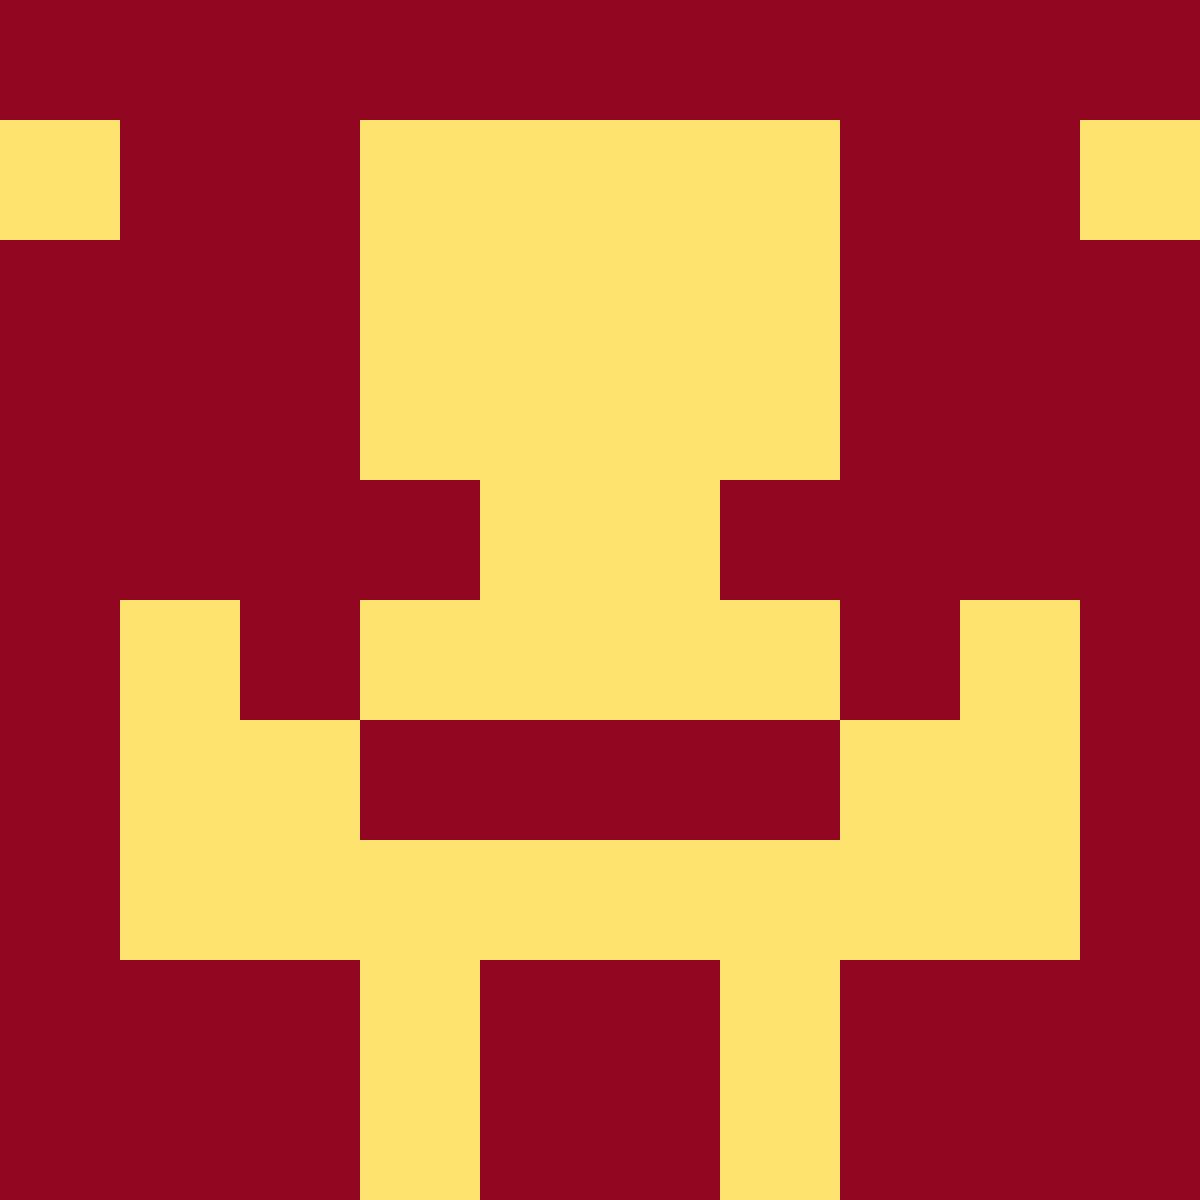 debian/wheezy/machinekit_0 1 1449918176-1travis kinsamanka